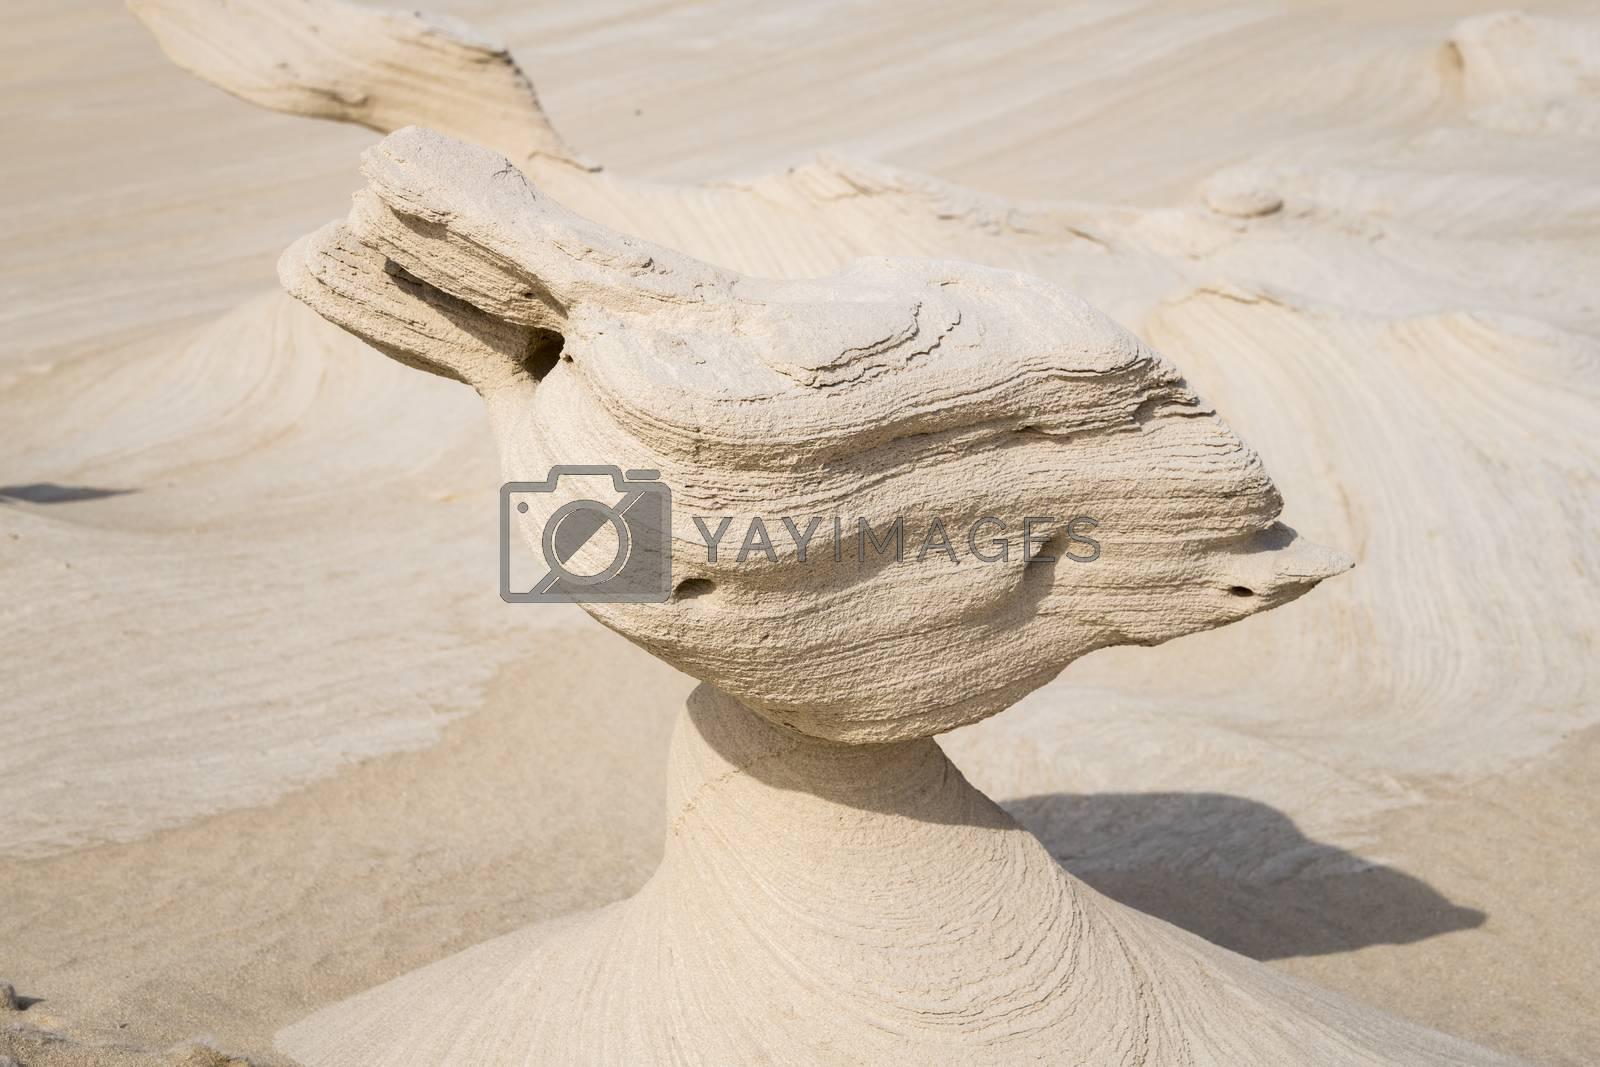 Al Wathba sand stones or Fossil Dunes in the desert of  Abu Dhabi, United Arab Emirates